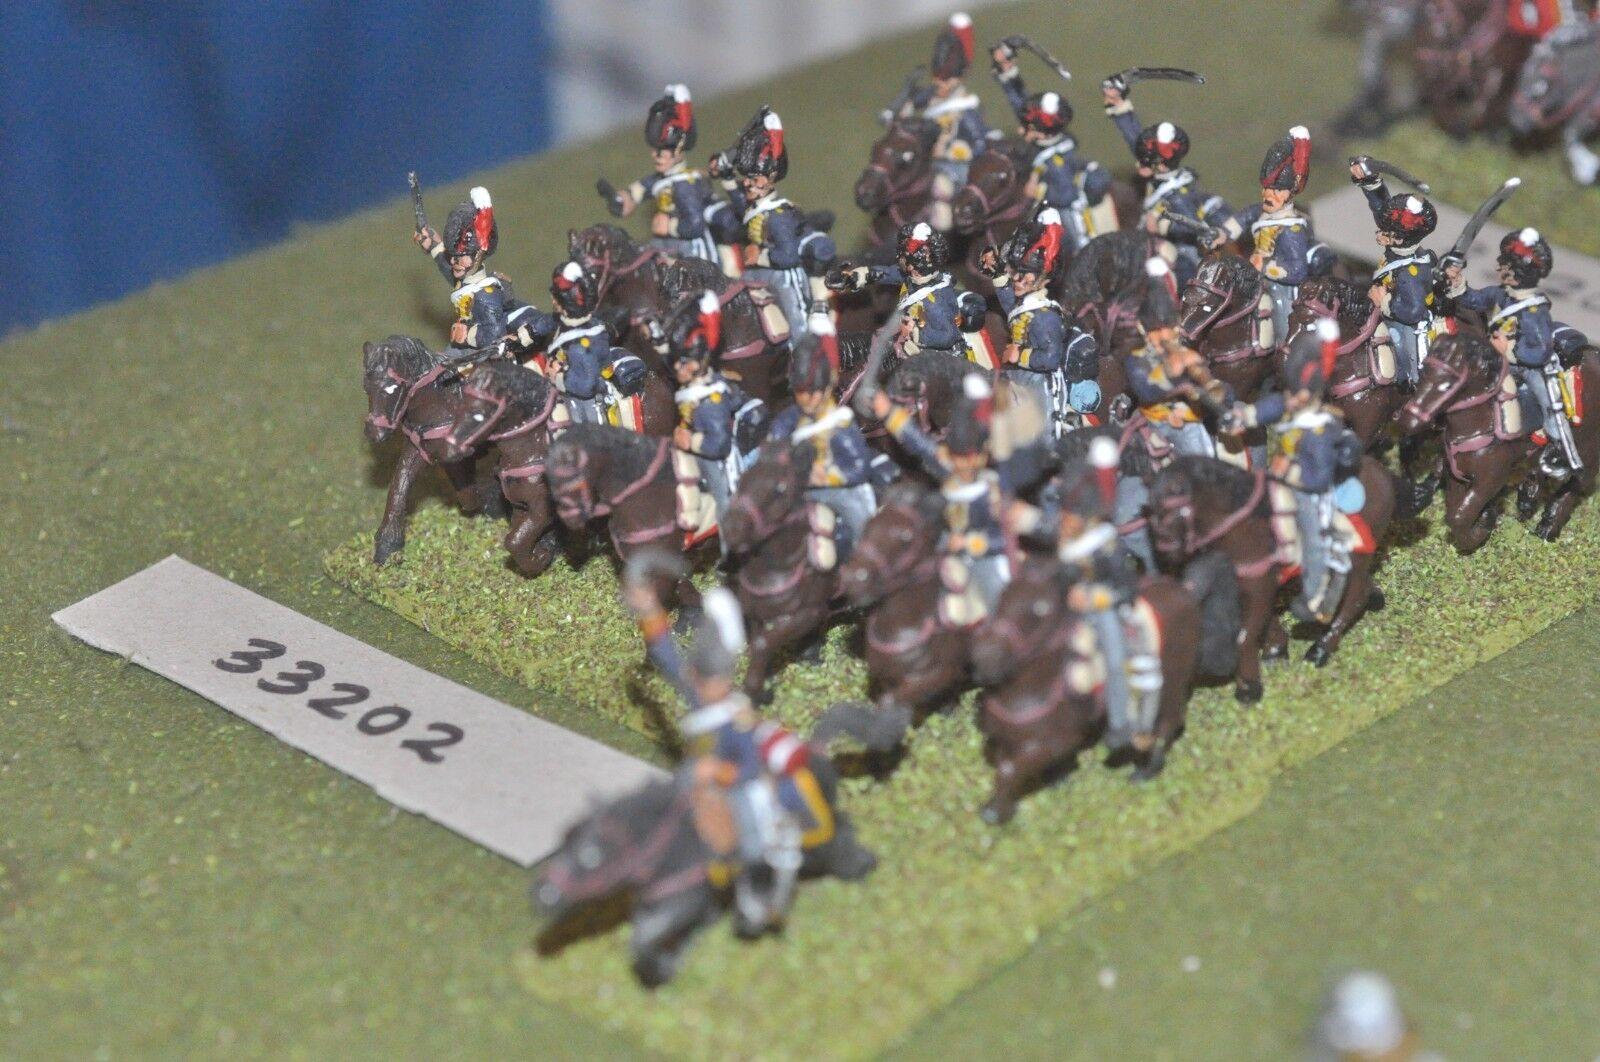 25 25 25 mm napoléoniennes/British-light dragoons 19 Figures-CAV (33202) 896827